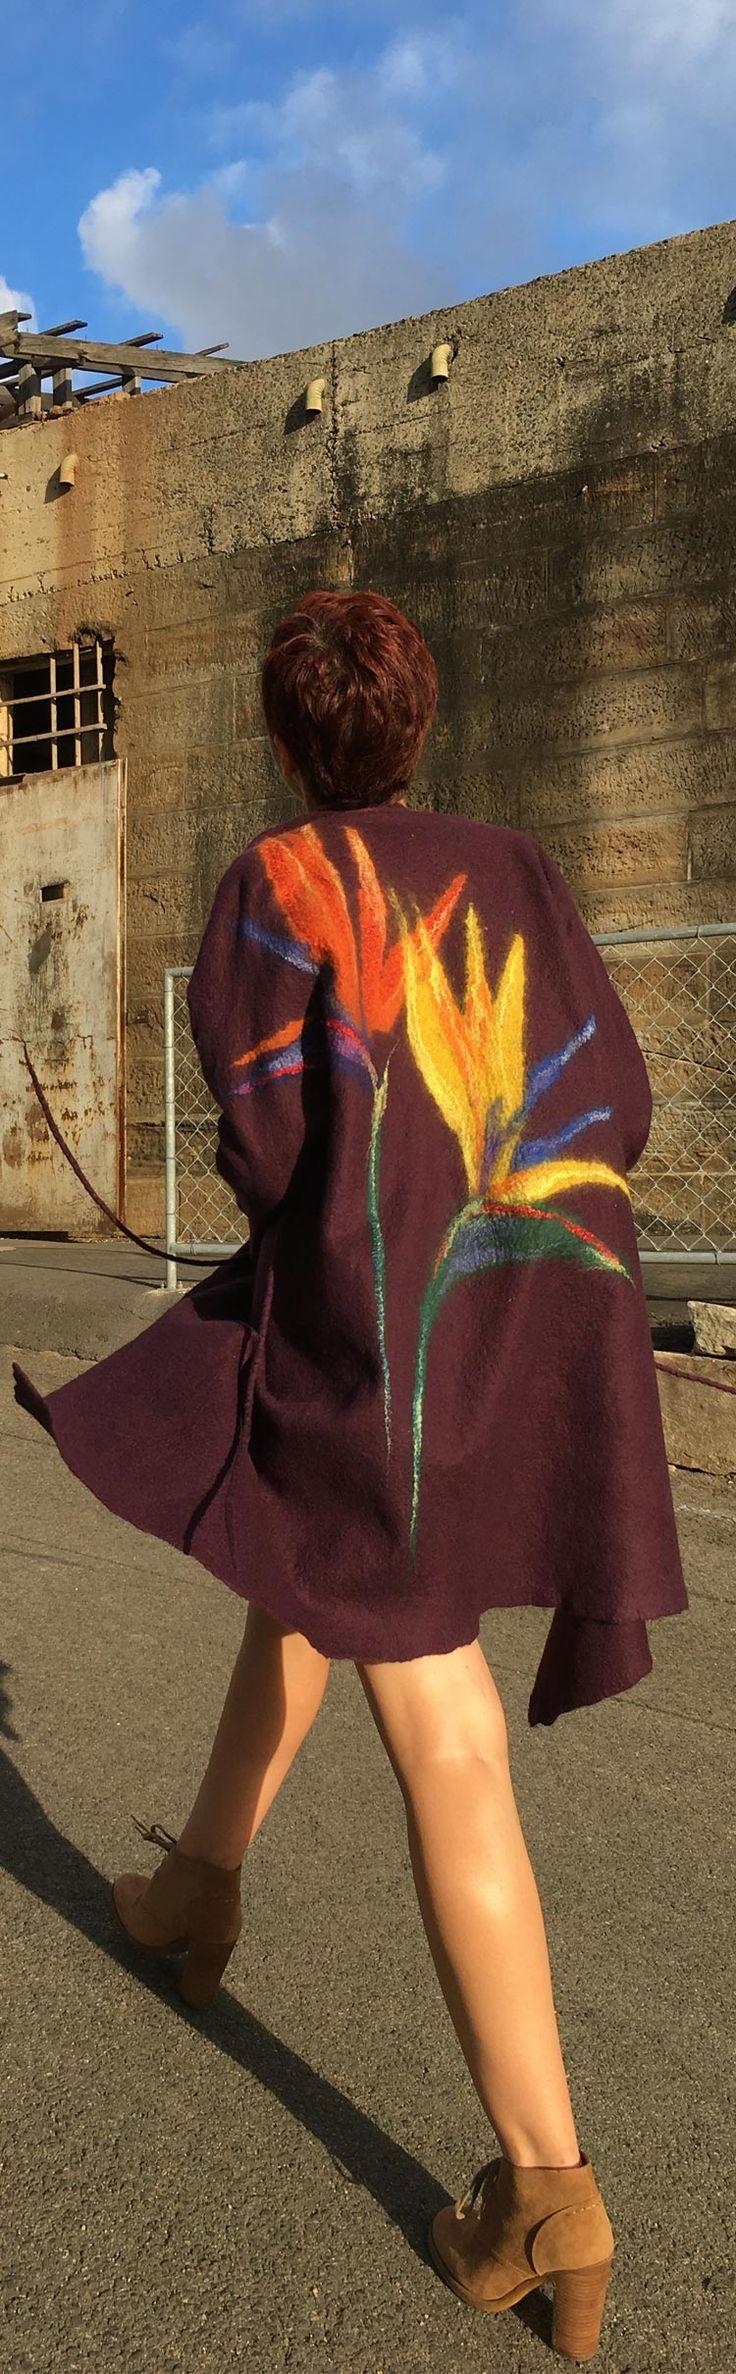 Fashion style cozy summer coat by Vera Alexanderova. #cozy #fashion #style #sustainablefashion #ecofashion #textiledesign #art #wearables